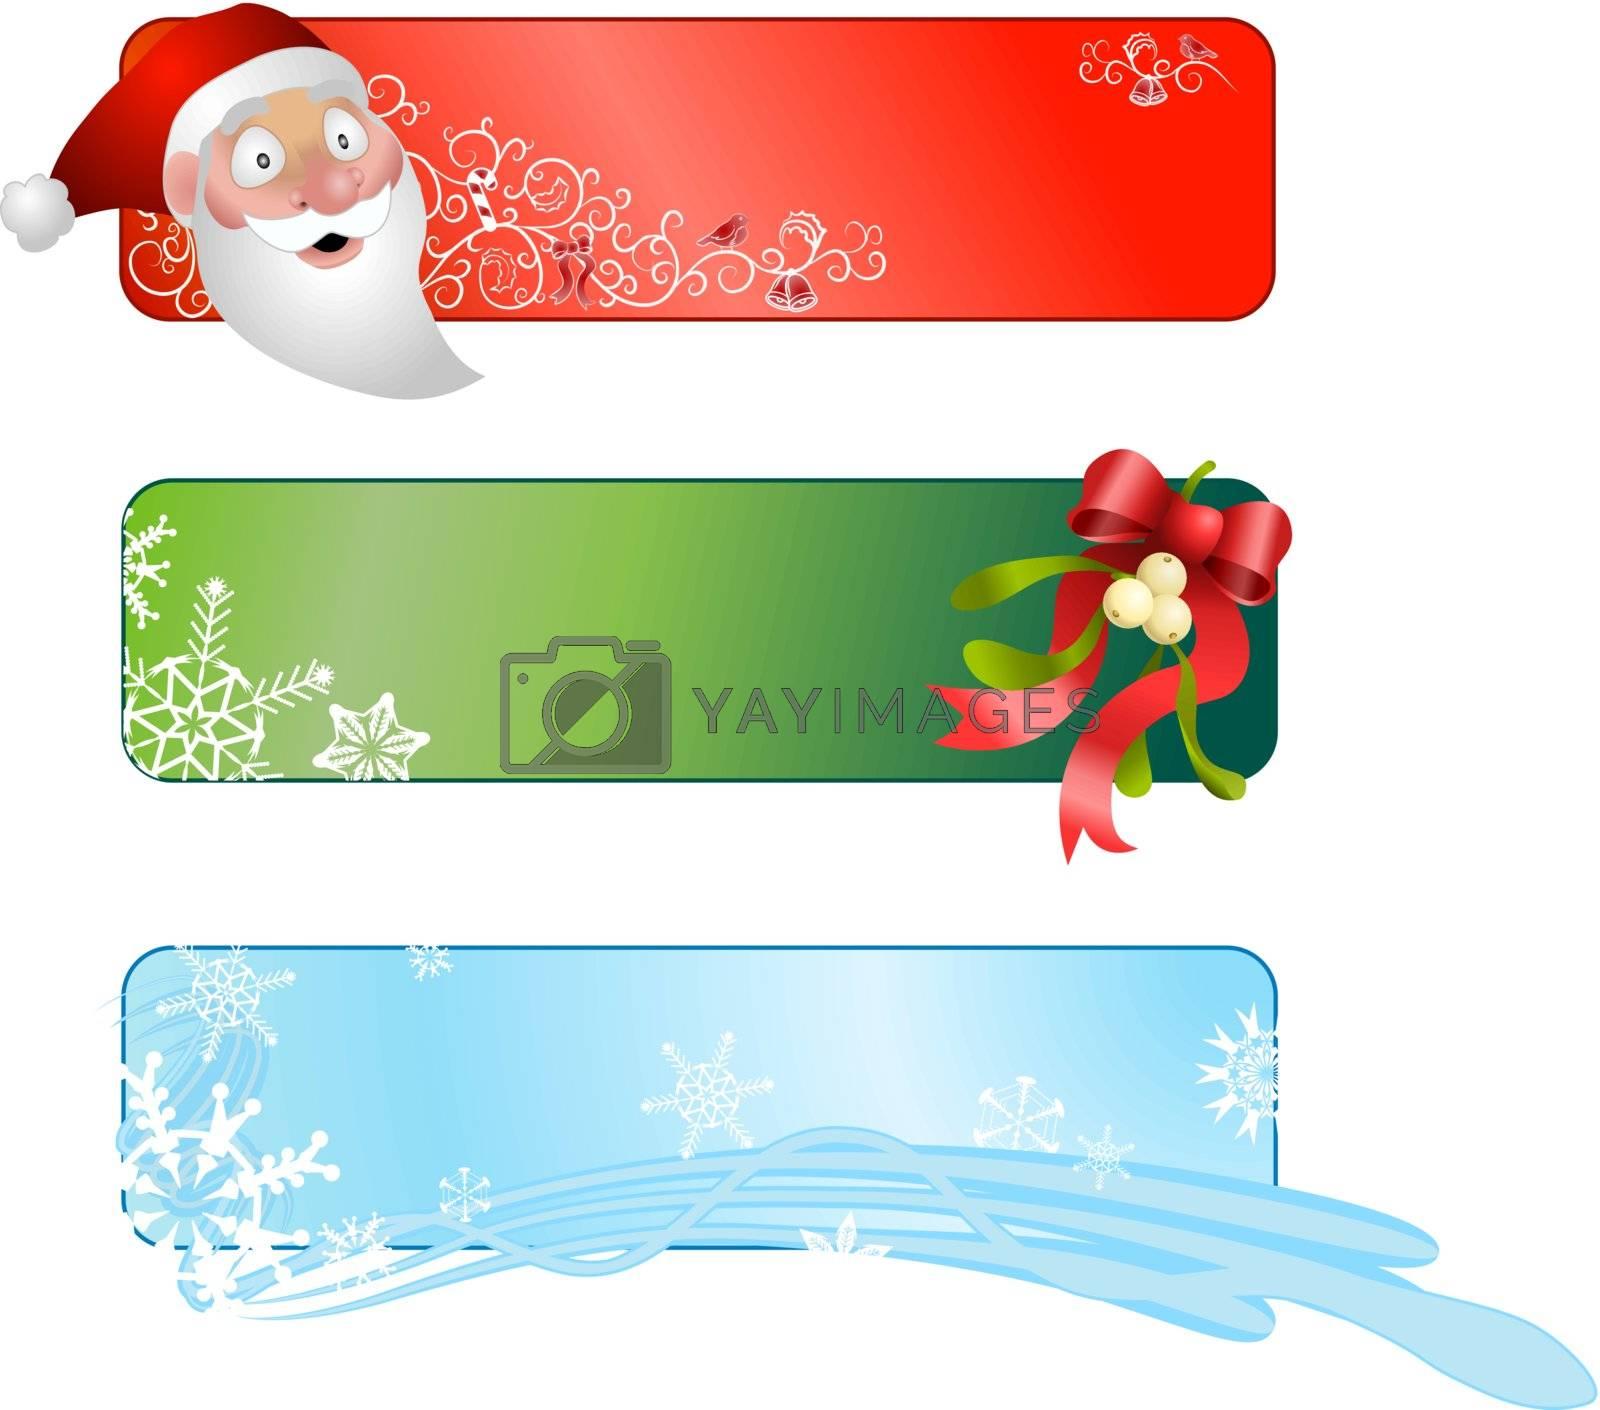 Christmas banners. Illustration of a set of three Christmas banners